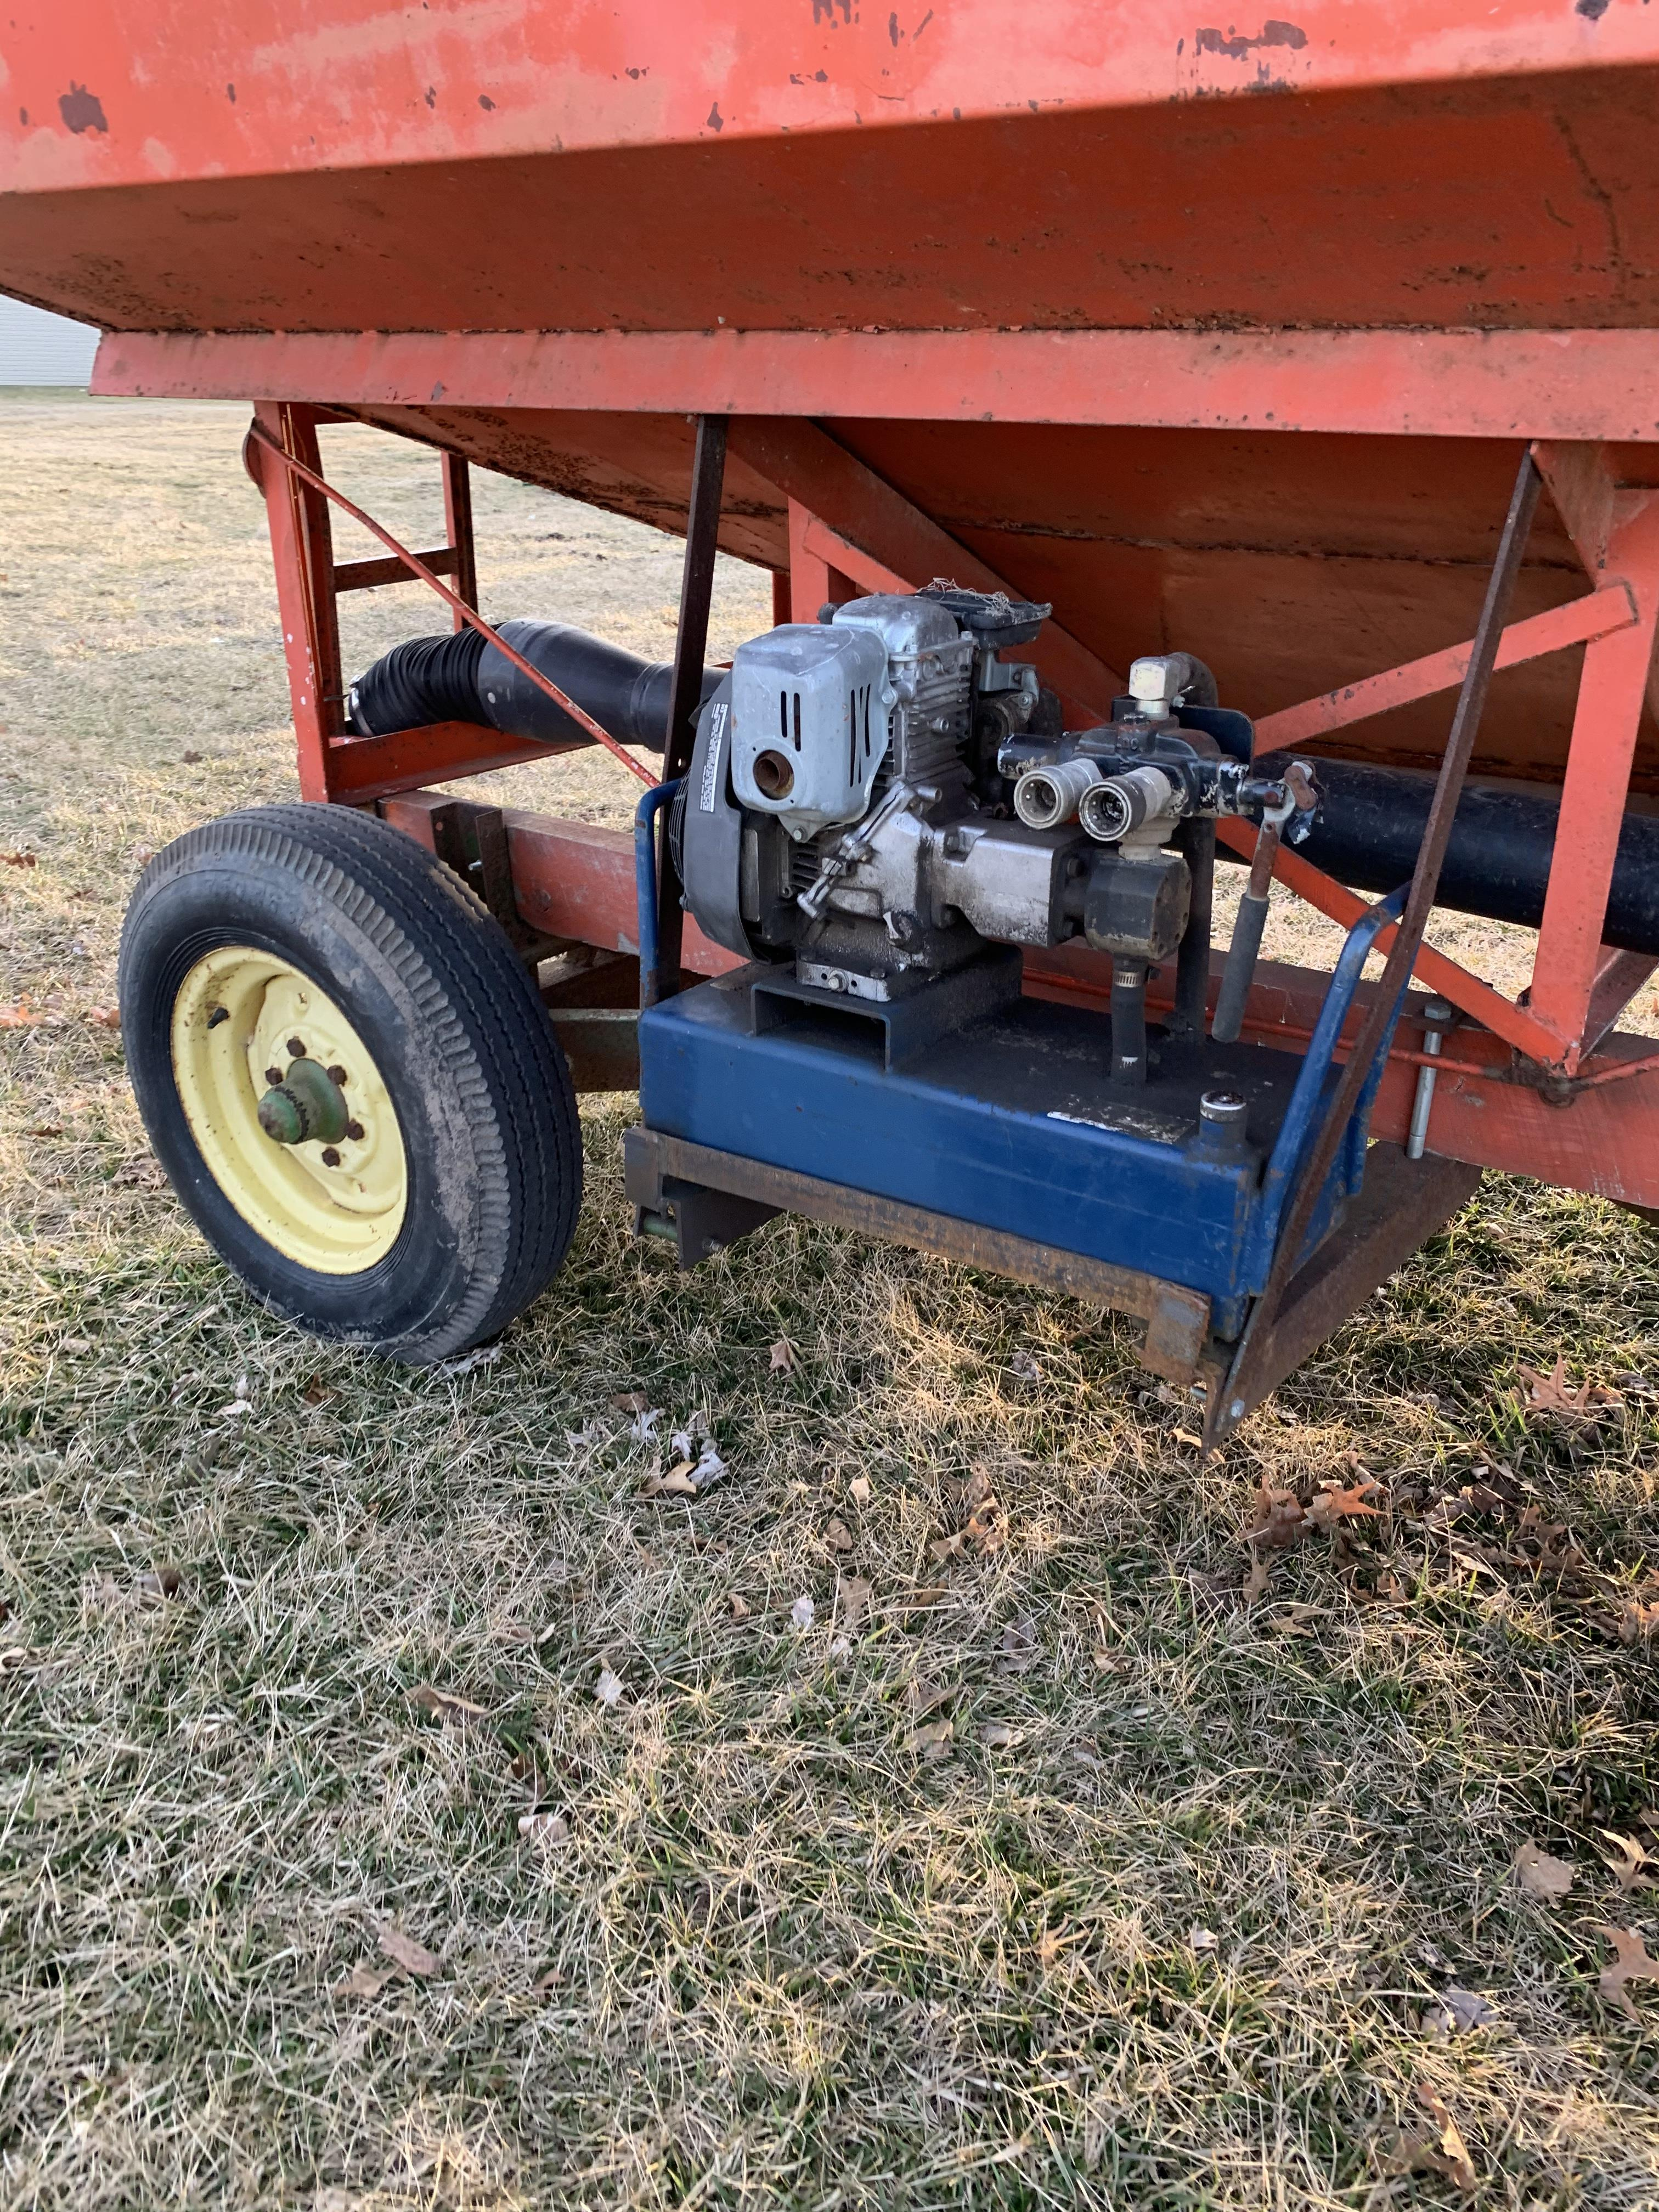 Killbros 250 Side Dump Wagon W/JD 1065 Gear, Hydraulic Drive Seed Auger - Image 4 of 4